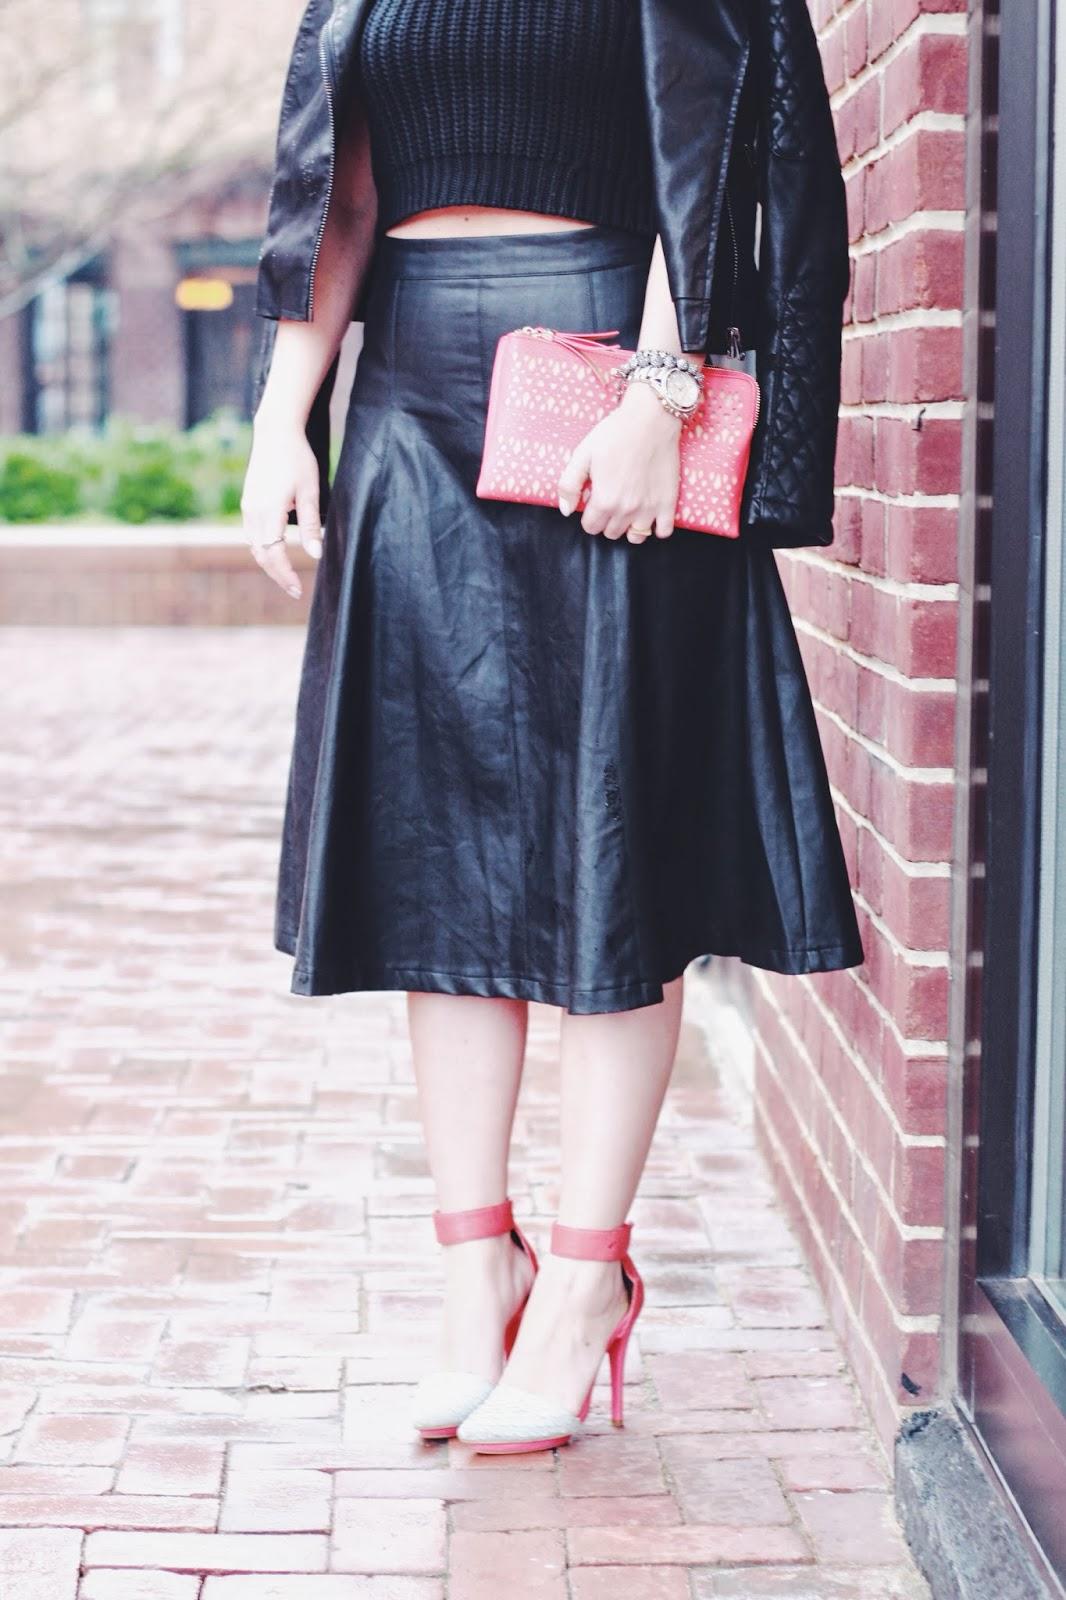 midi skirt, leather skirts, crop tops, fashion blogger, dc blog, fashion trends 2014, spring fashion